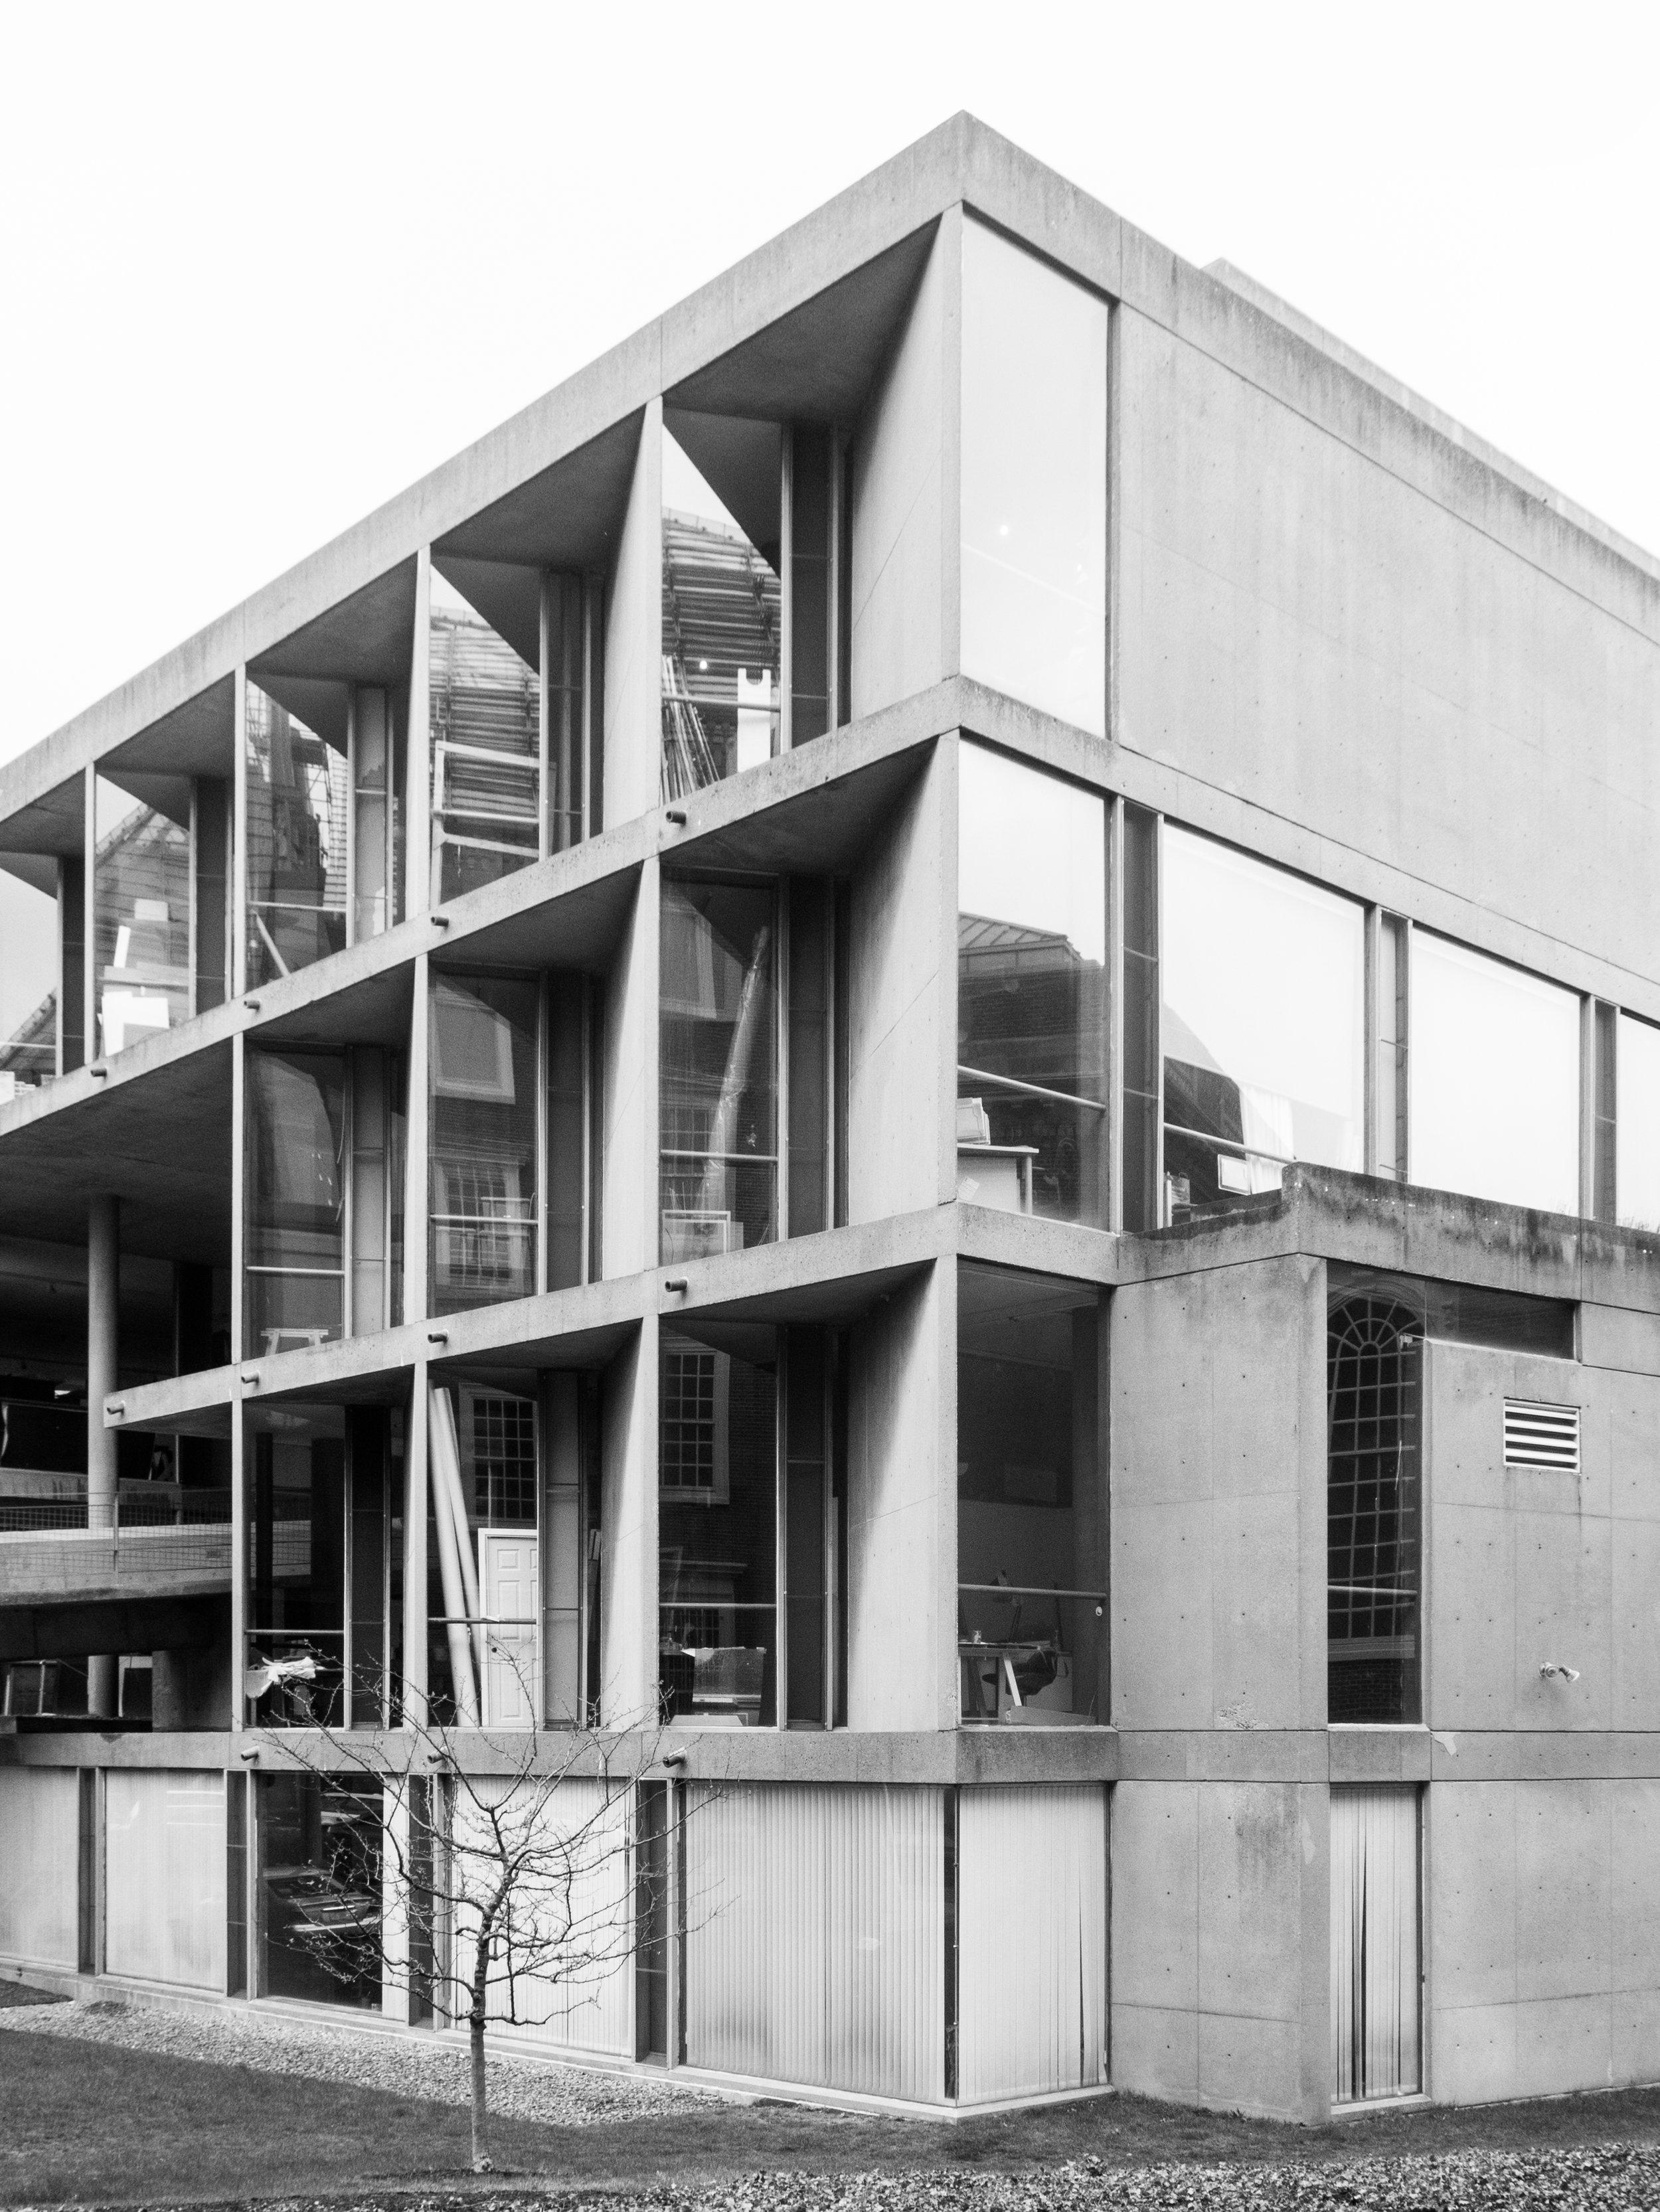 Carpenter Centre for the Visual Arts designed by Le Corbusier, Harvard University